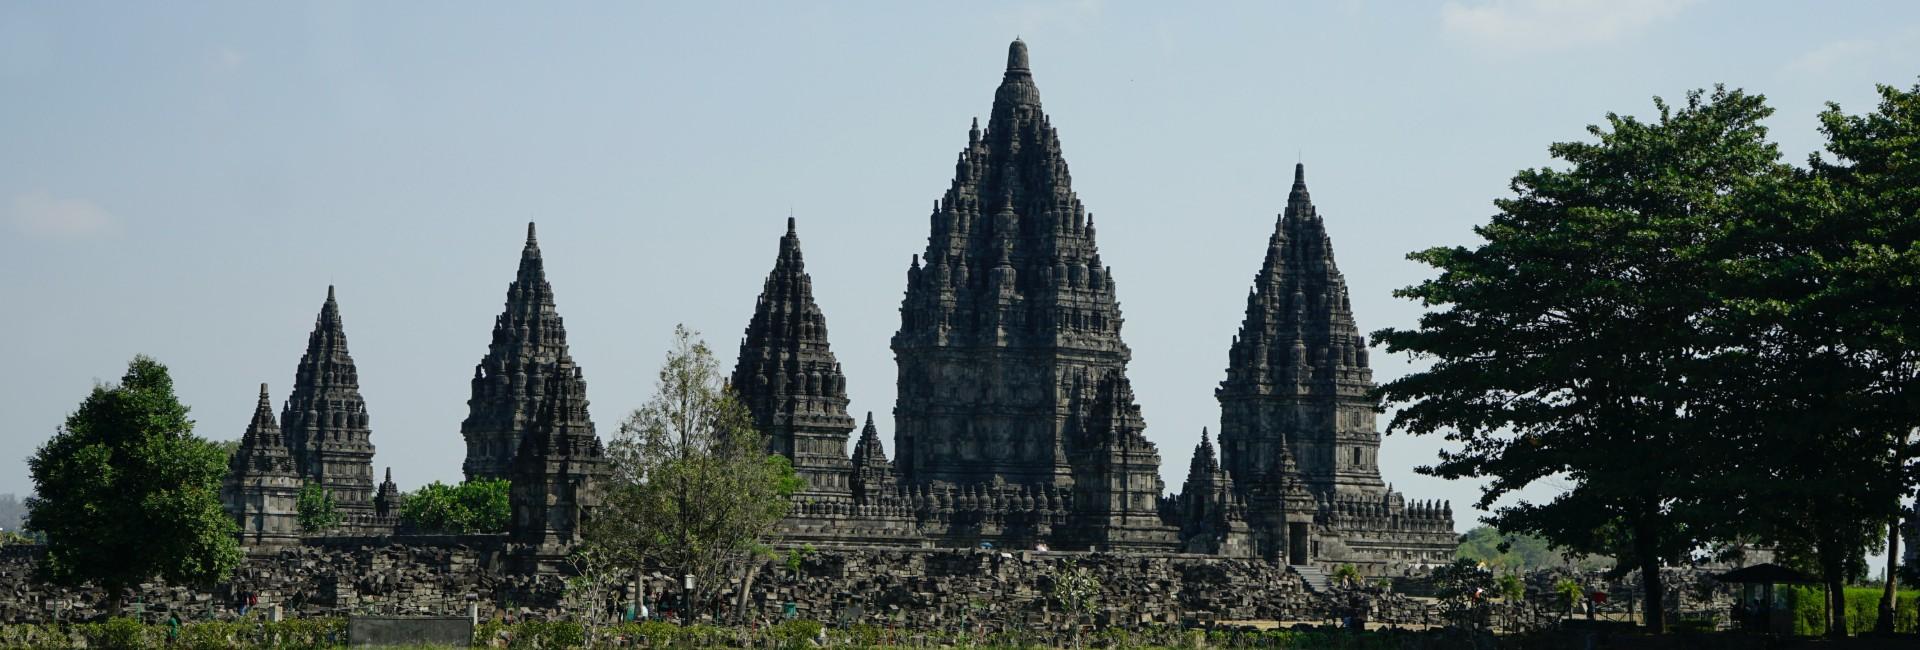 Découvrir le complexe de temples Prambanan